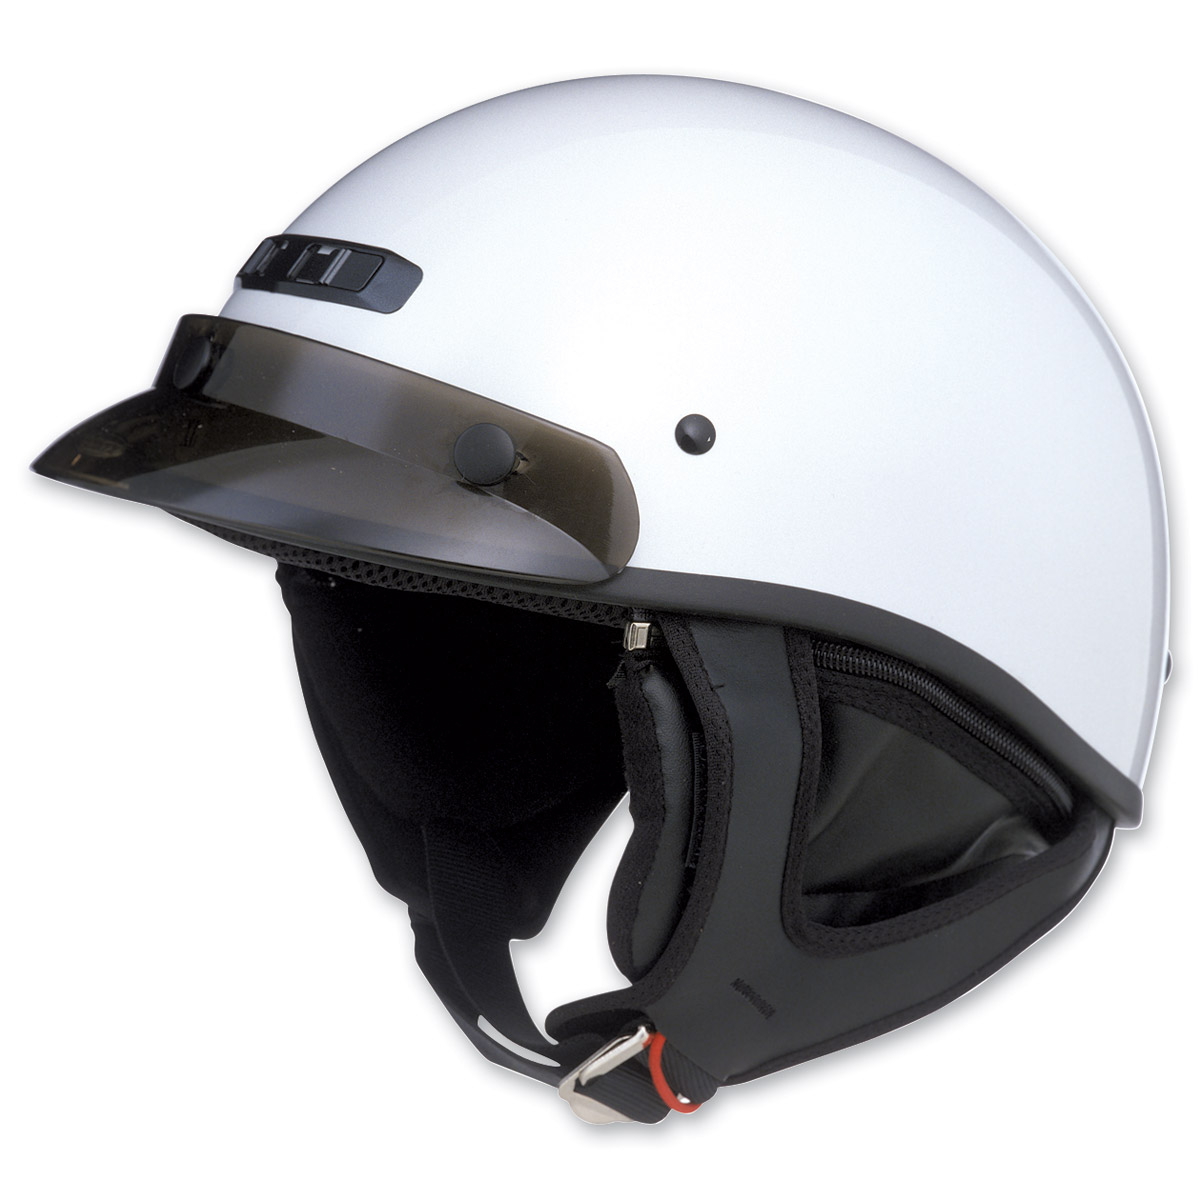 GMAX GM35 Fully Dressed Pearl White Half Helmet